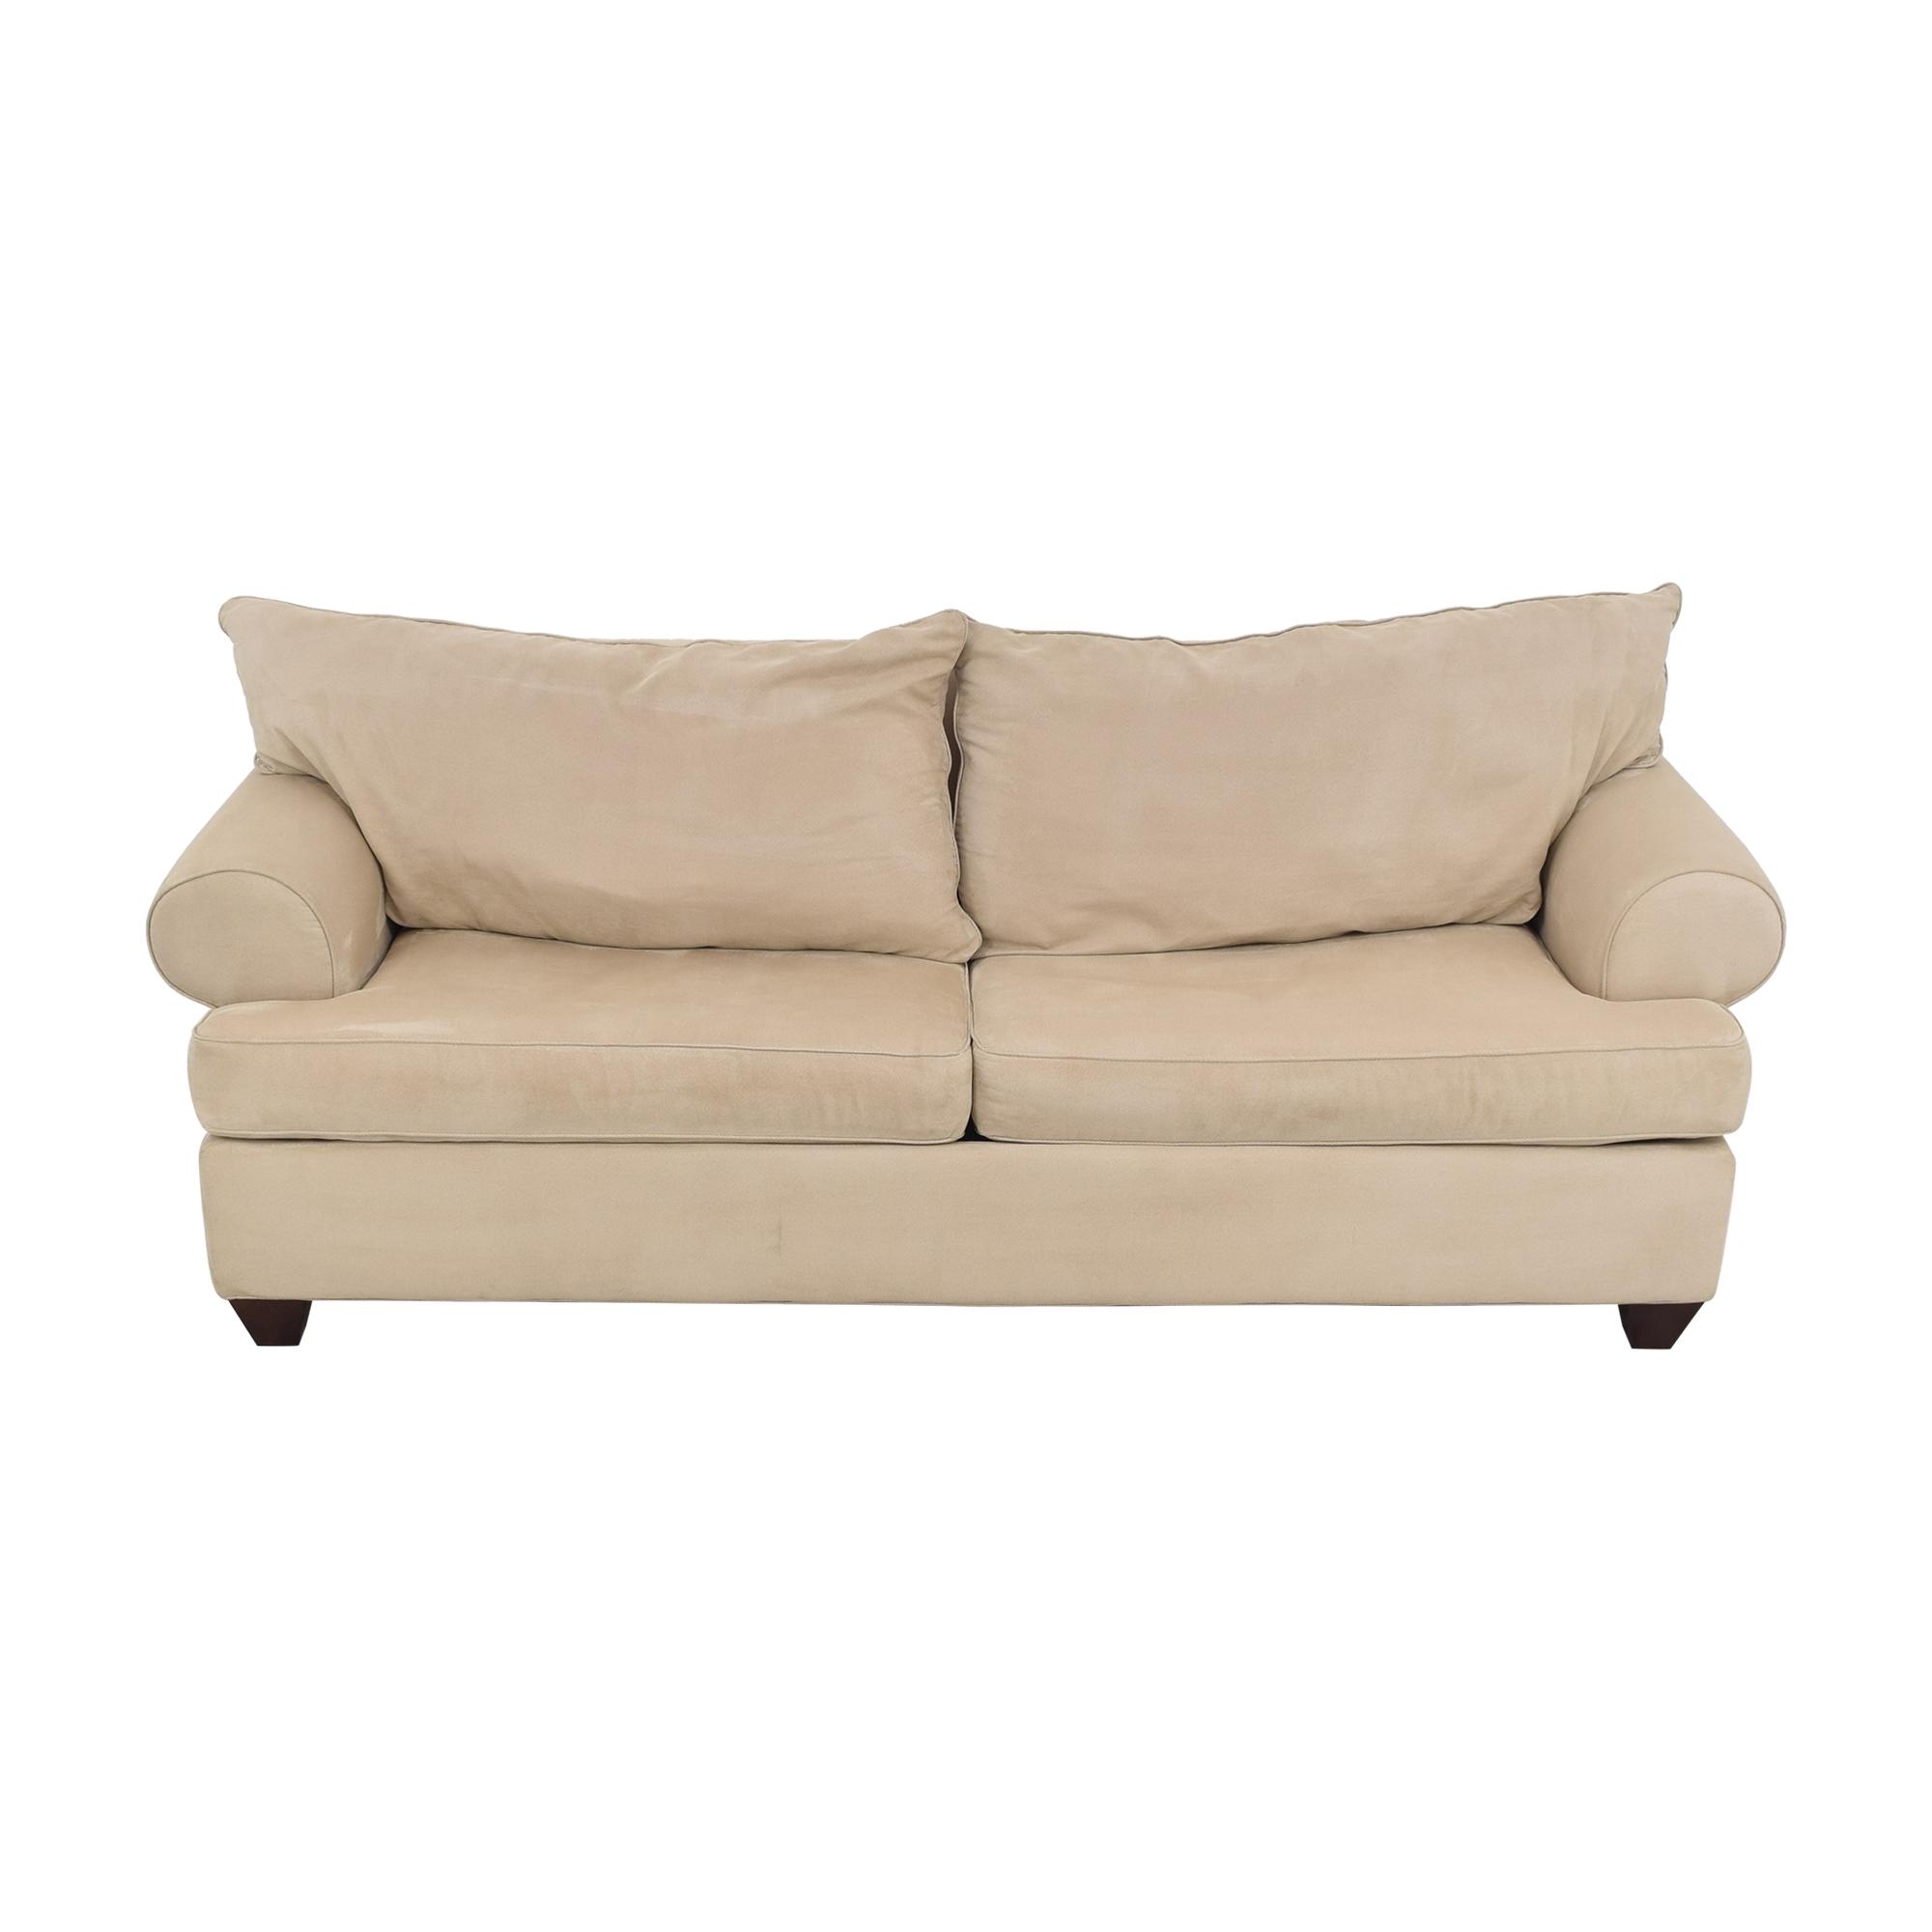 Raymour & Flanigan Raymour & Flanigan Sleeper Sofa ct